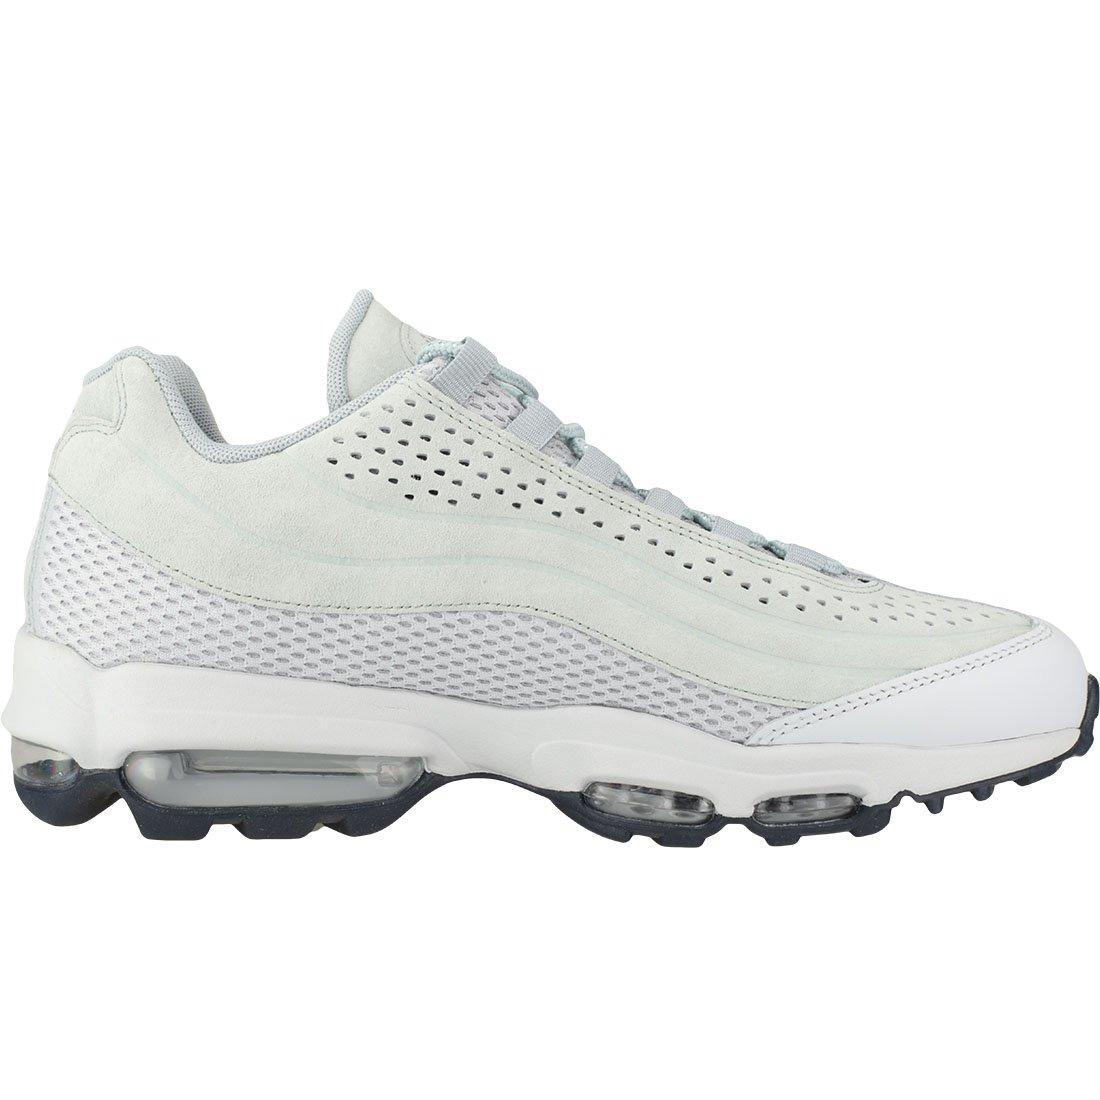 Nike Air Max 95 Ultra Premium Br Mens Light Green Grey Running Trainers